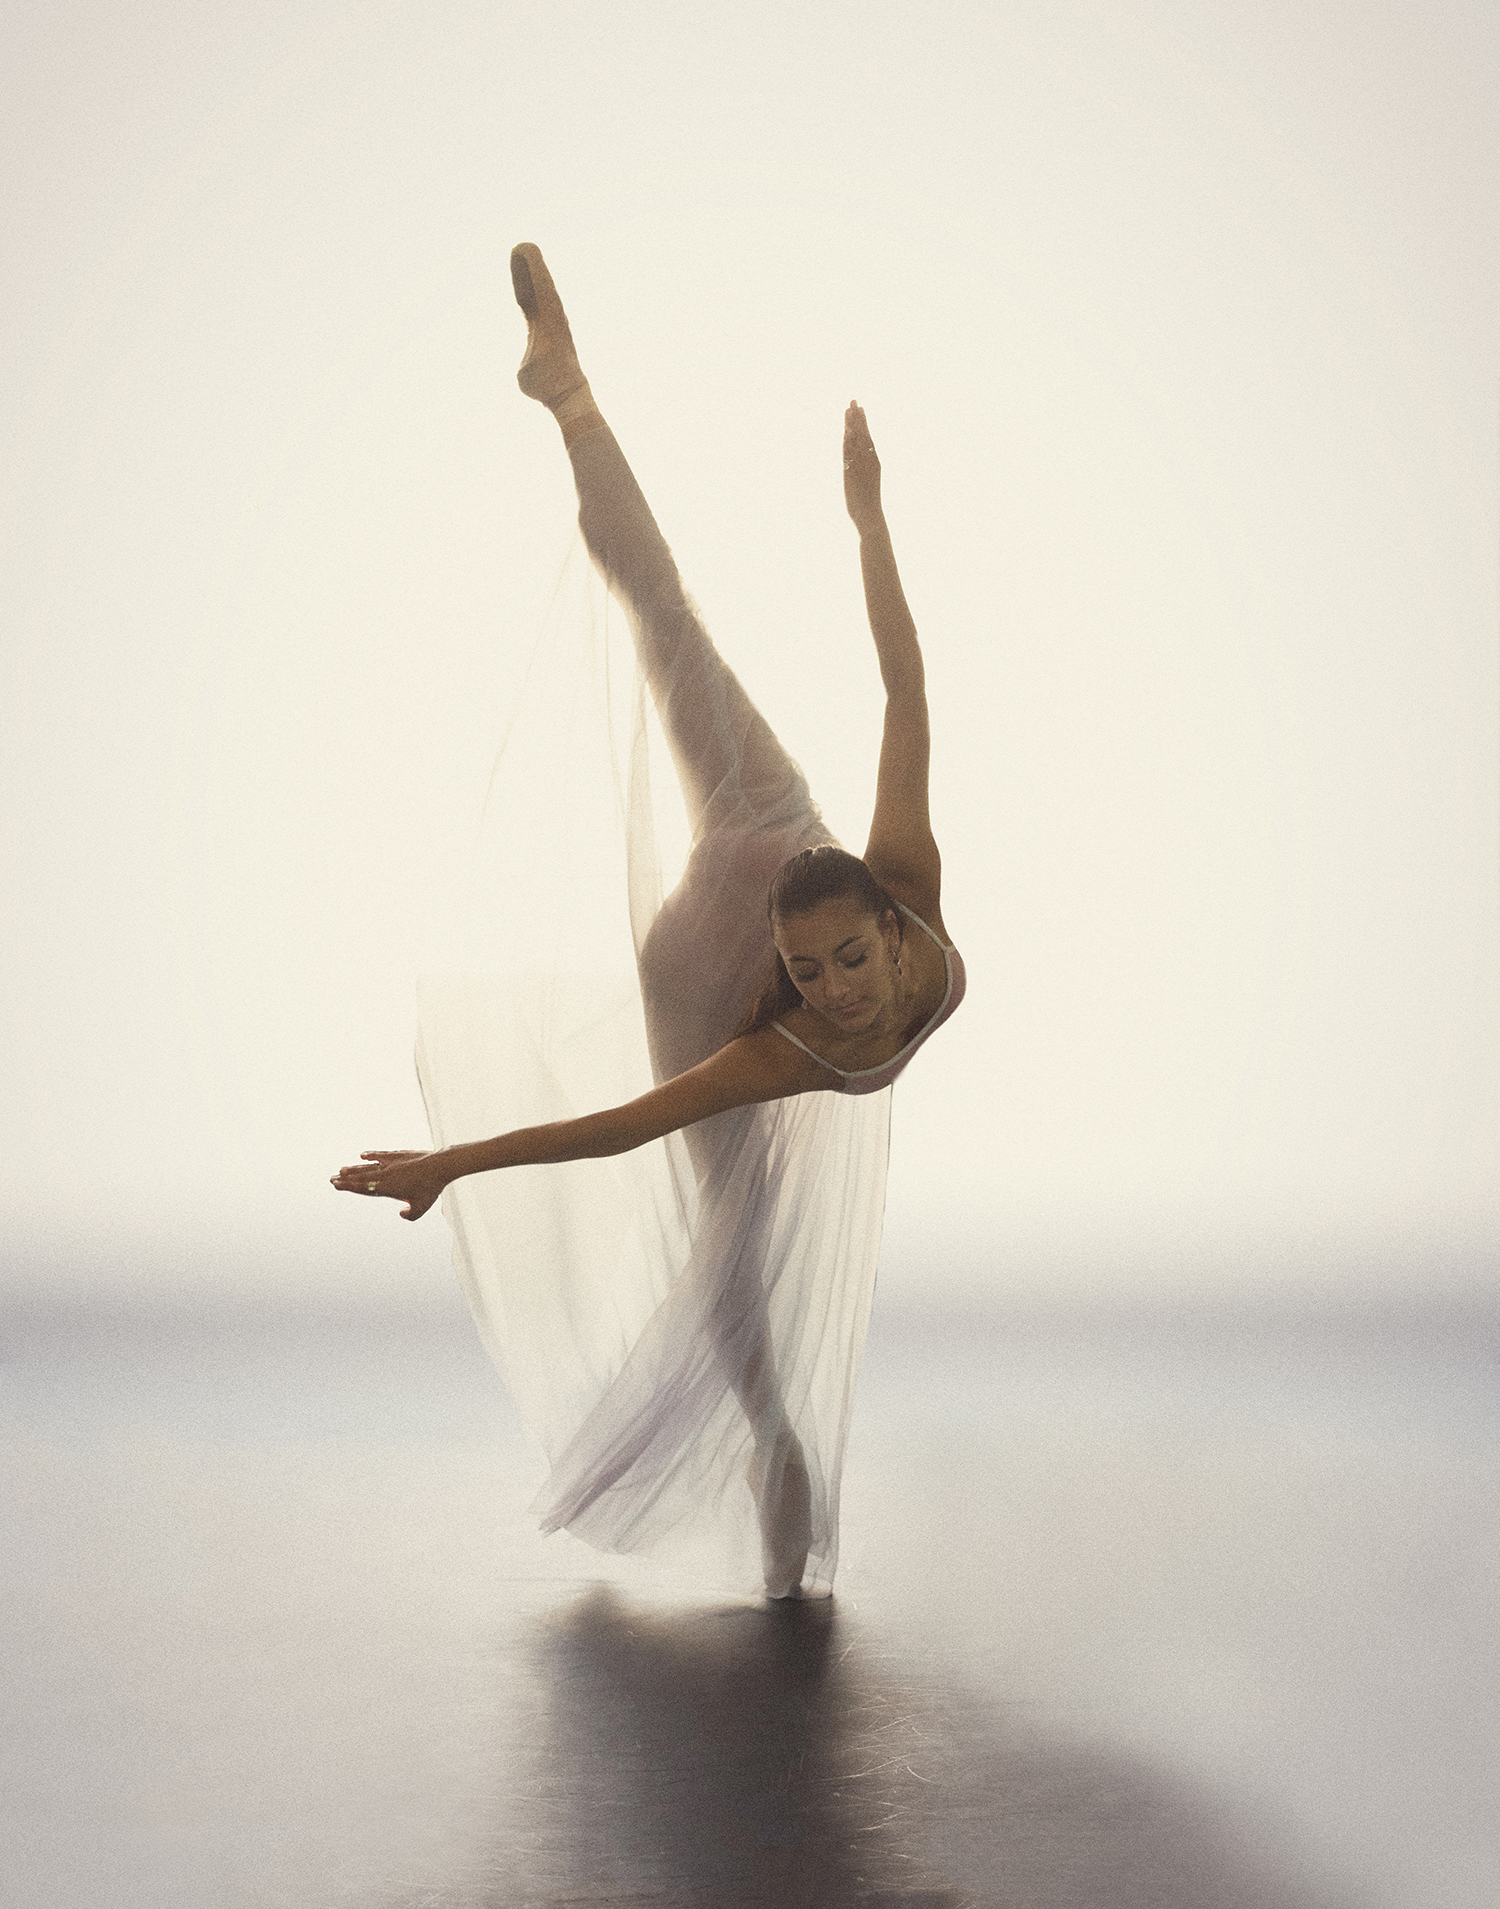 Maddie Medina-136-fin-11x14-wood.jpg